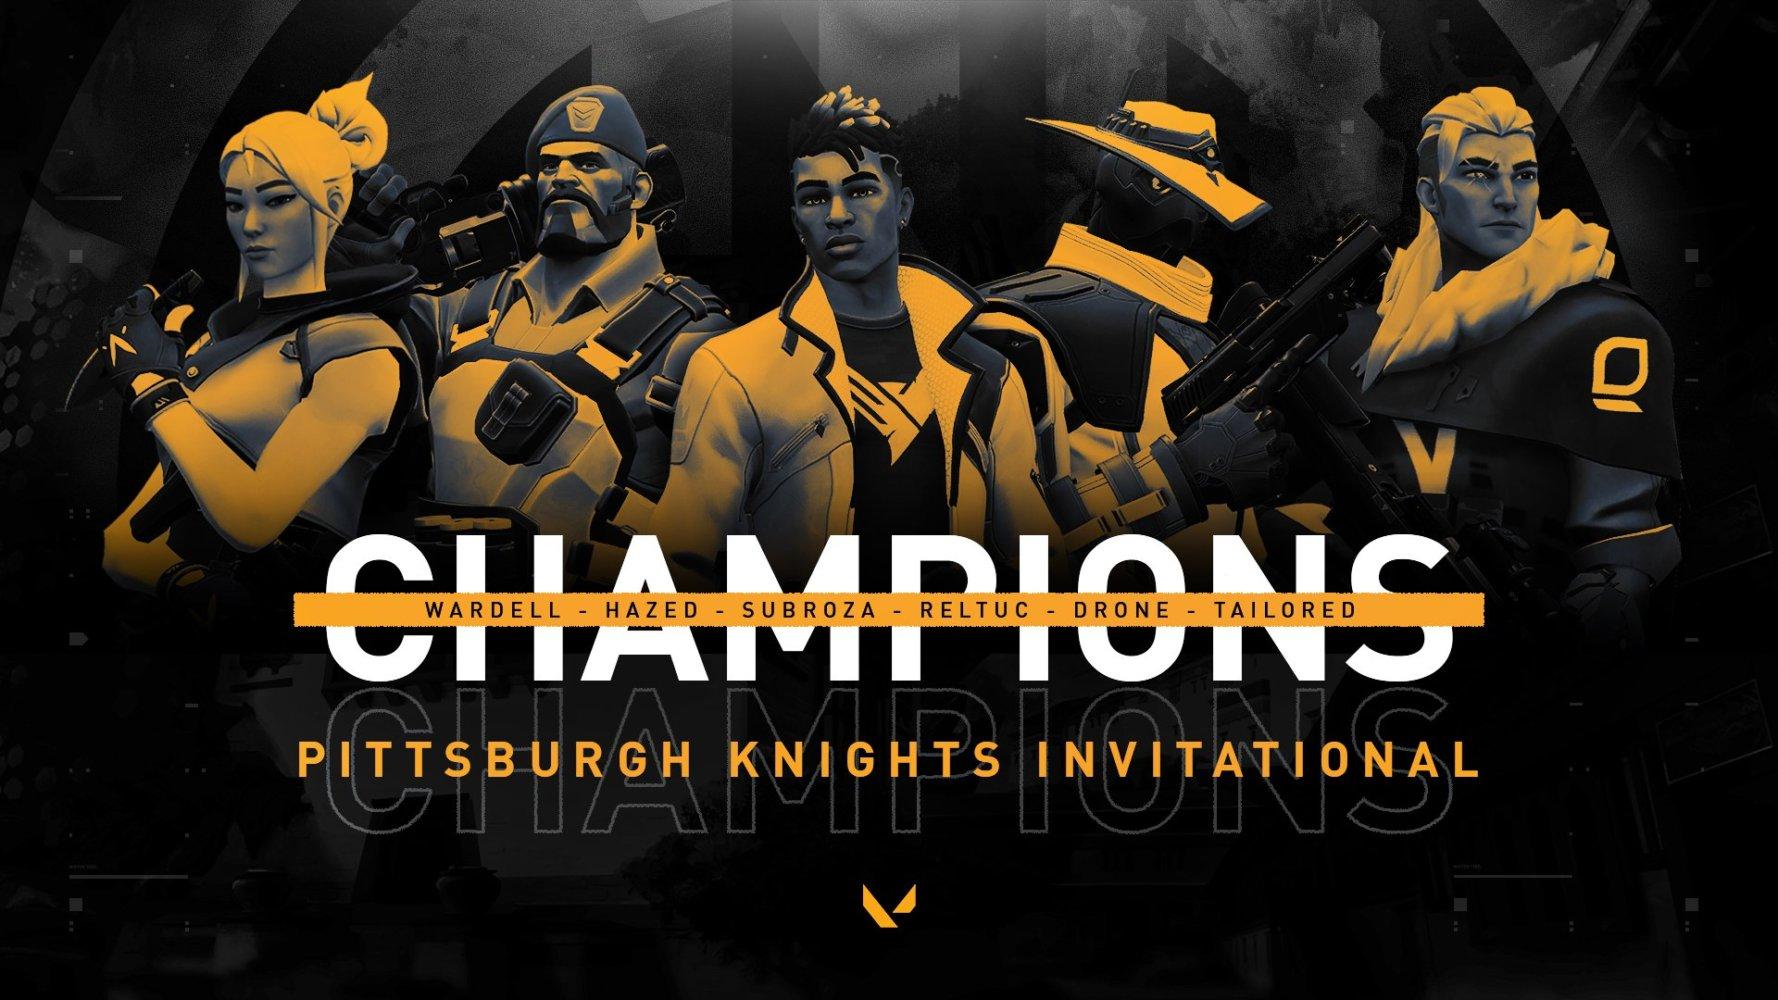 pittsburgh knights invitational tsm